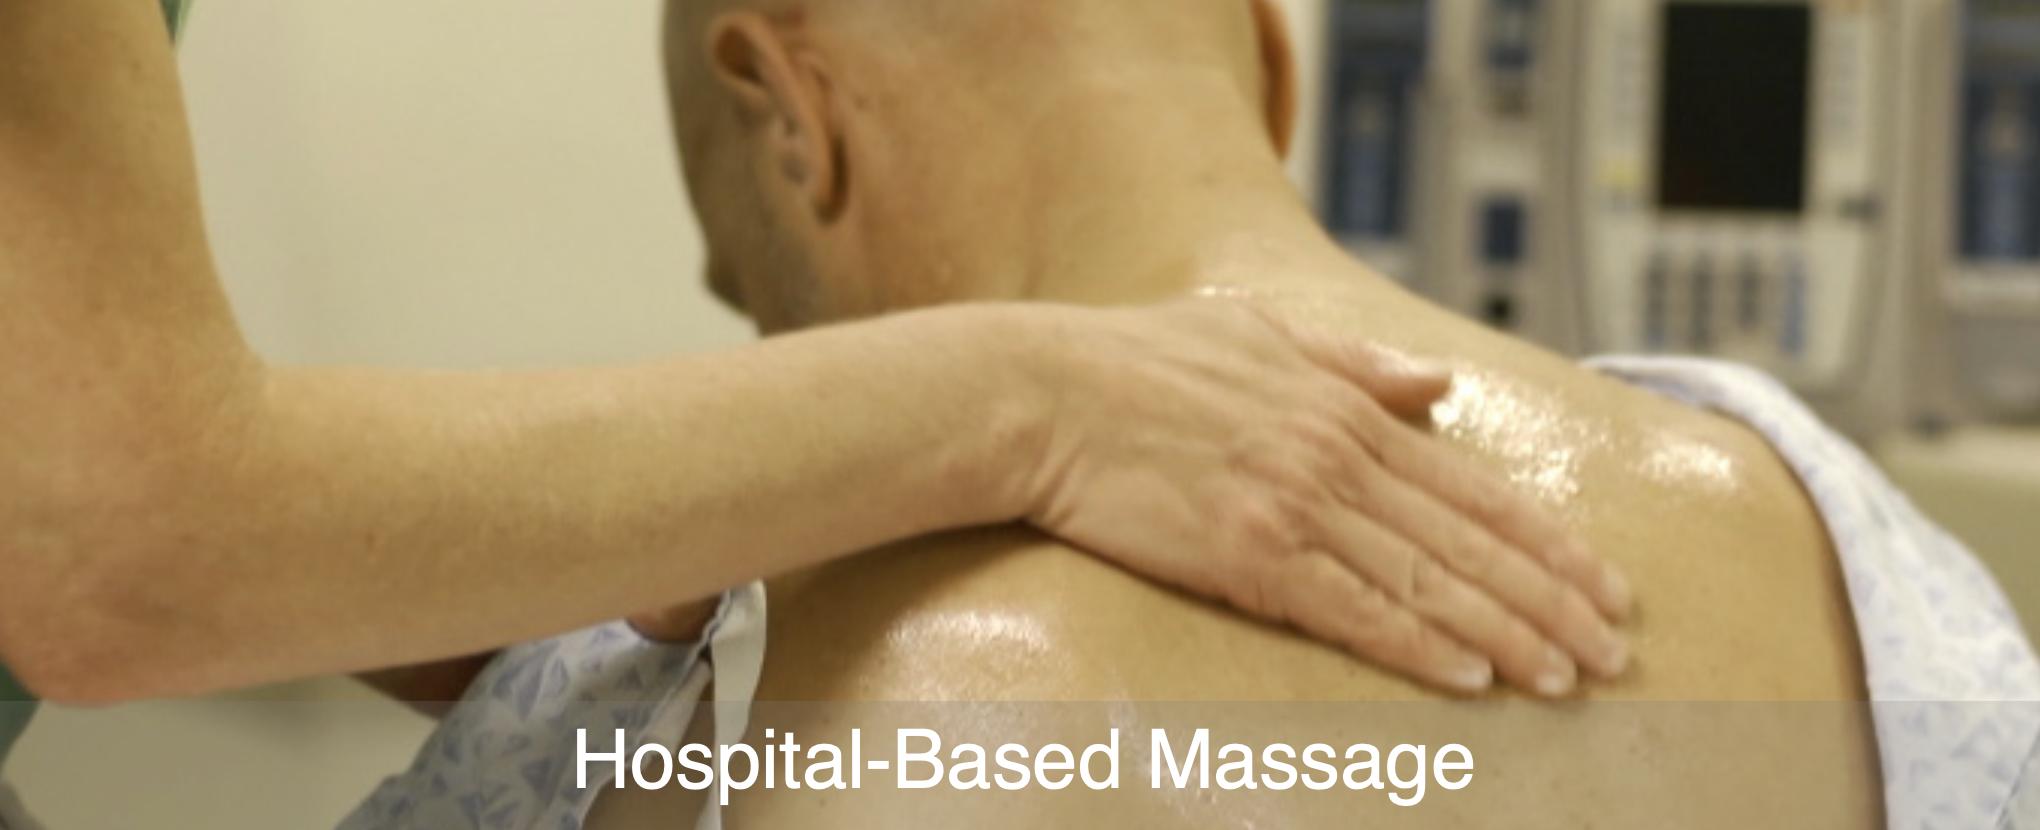 greet the day hospital based massage